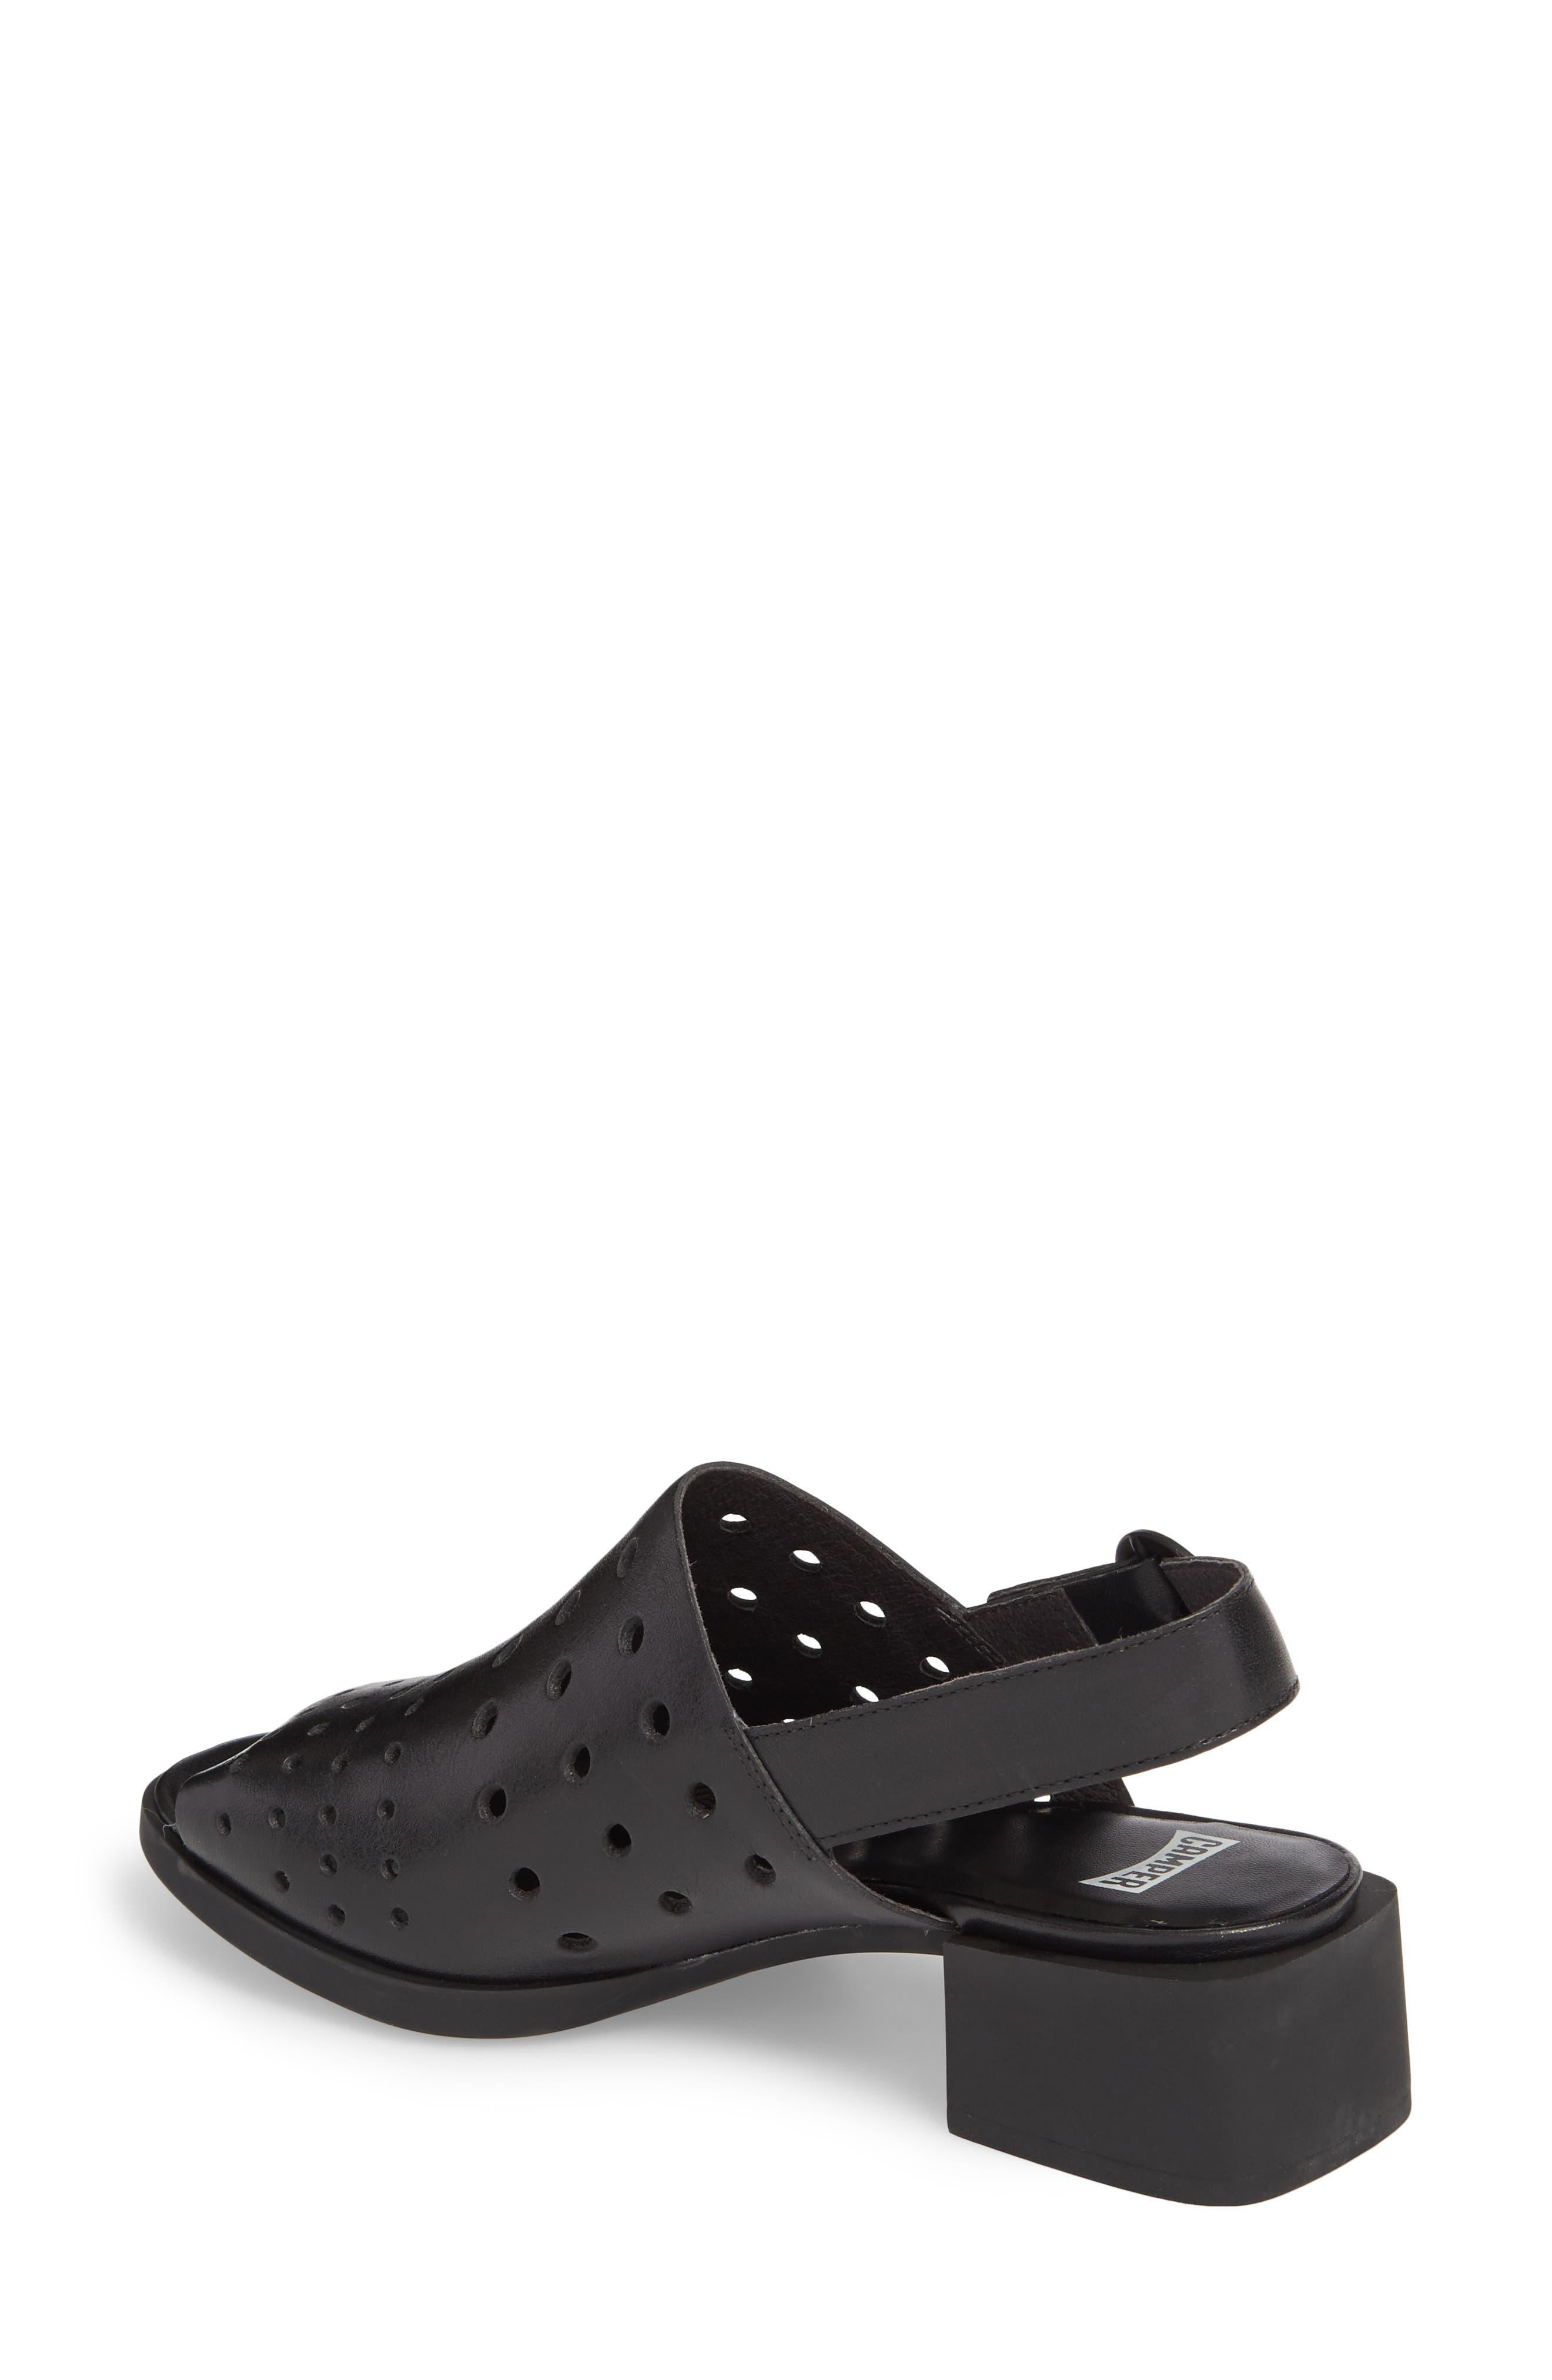 Twins Sandal,                             Alternate thumbnail 2, color,                             Black Leather